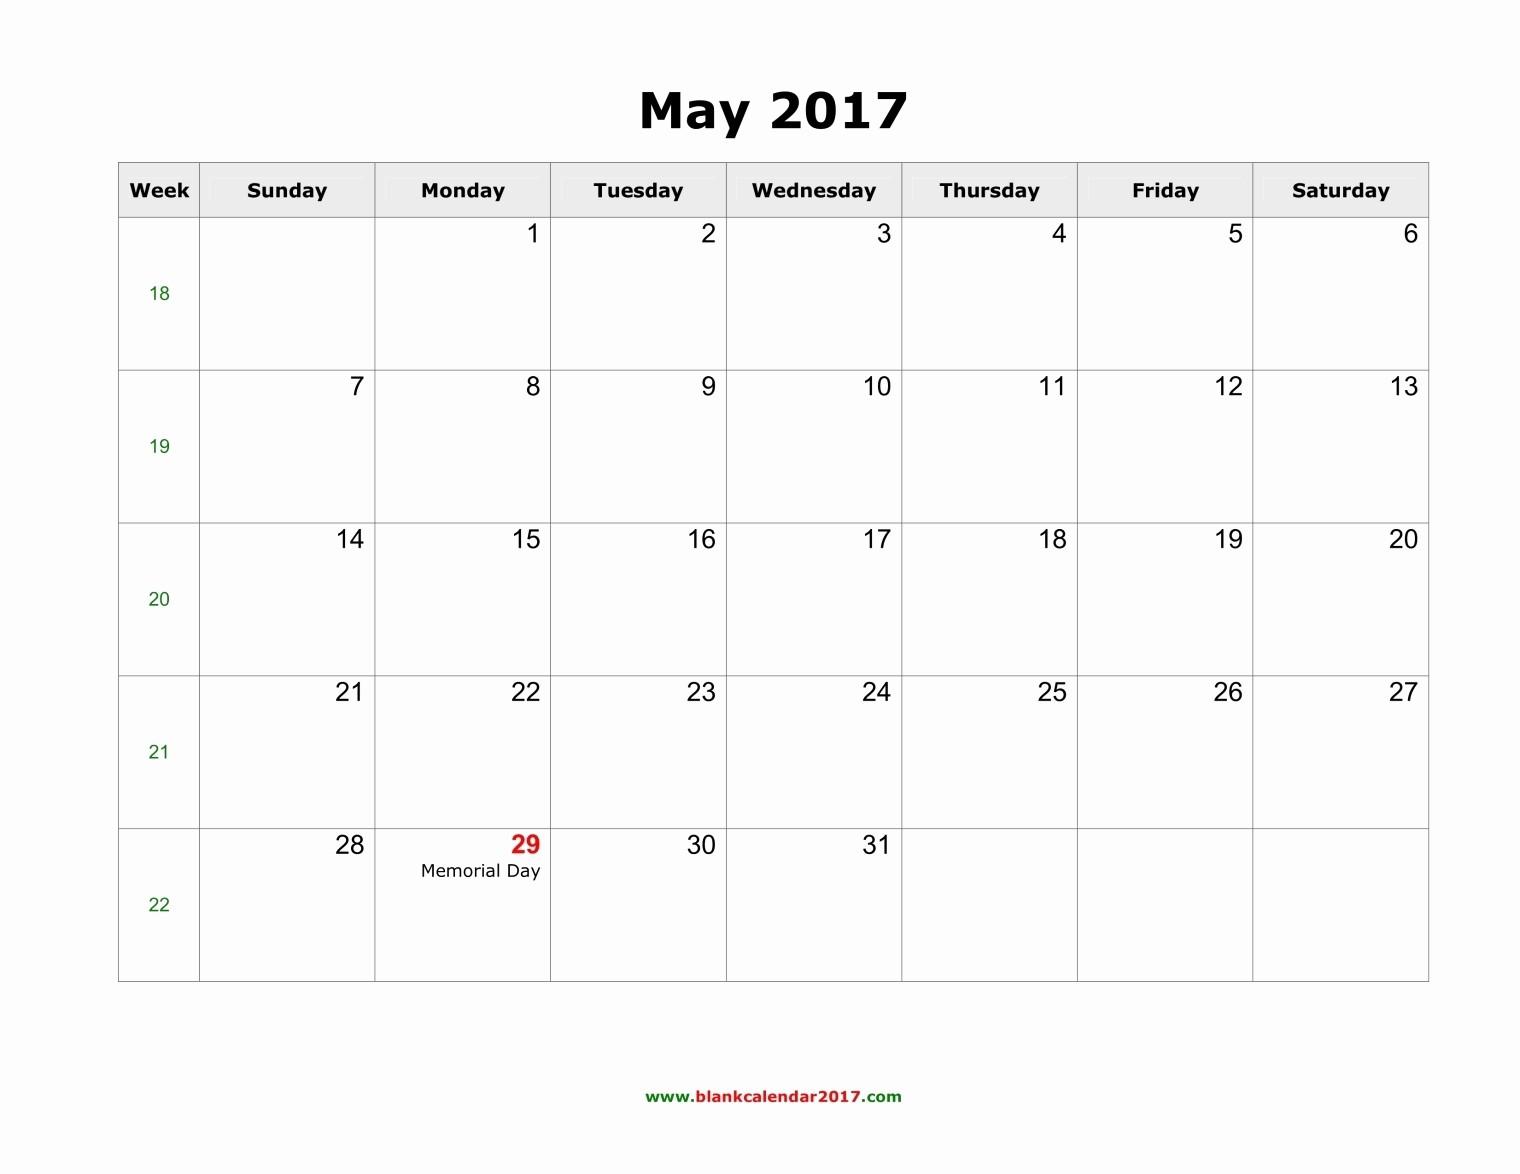 Blank May Calendar 2017 Printable Fresh May 2017 Calendar with Holidays